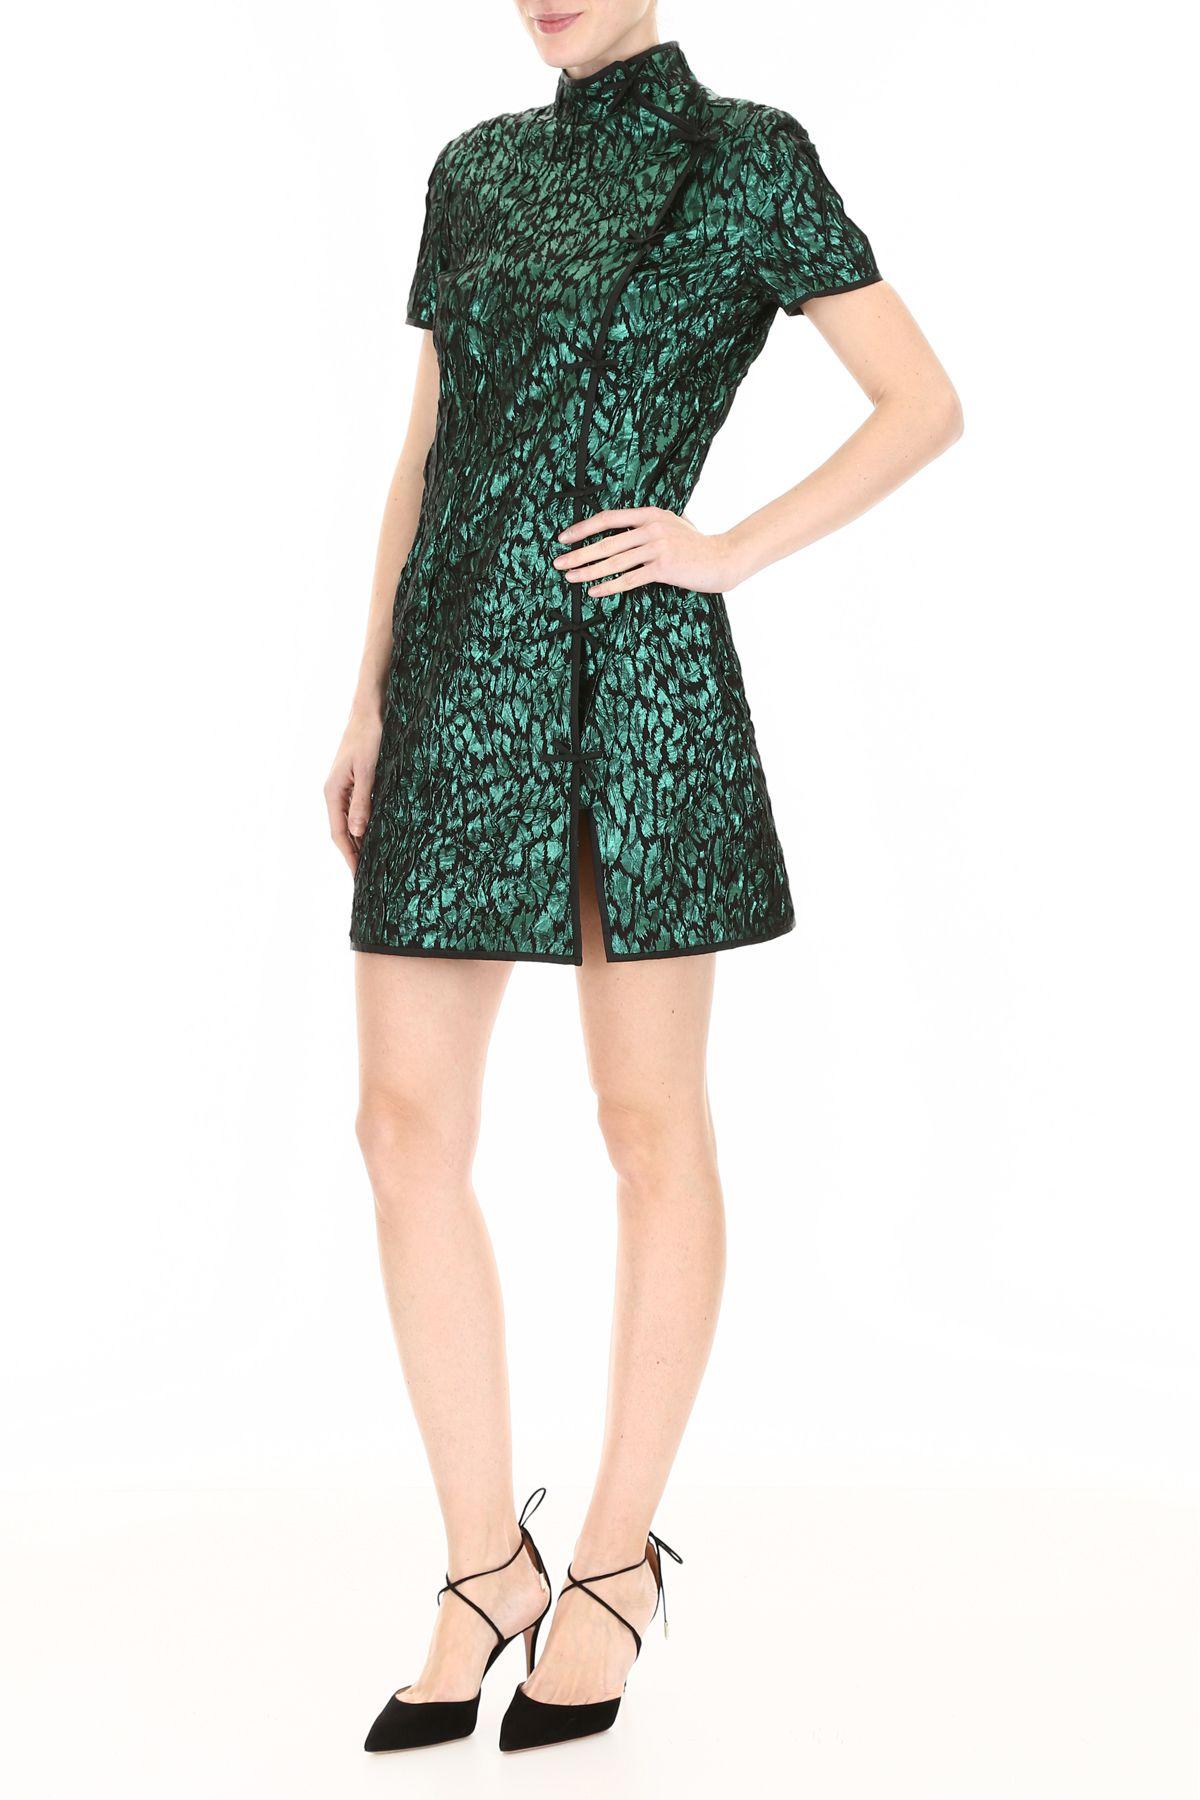 418033c3e0c1b Miu Miu Miu Miu Jacquard Mini Dress - SMERALDO (Black) - 10797563 ...